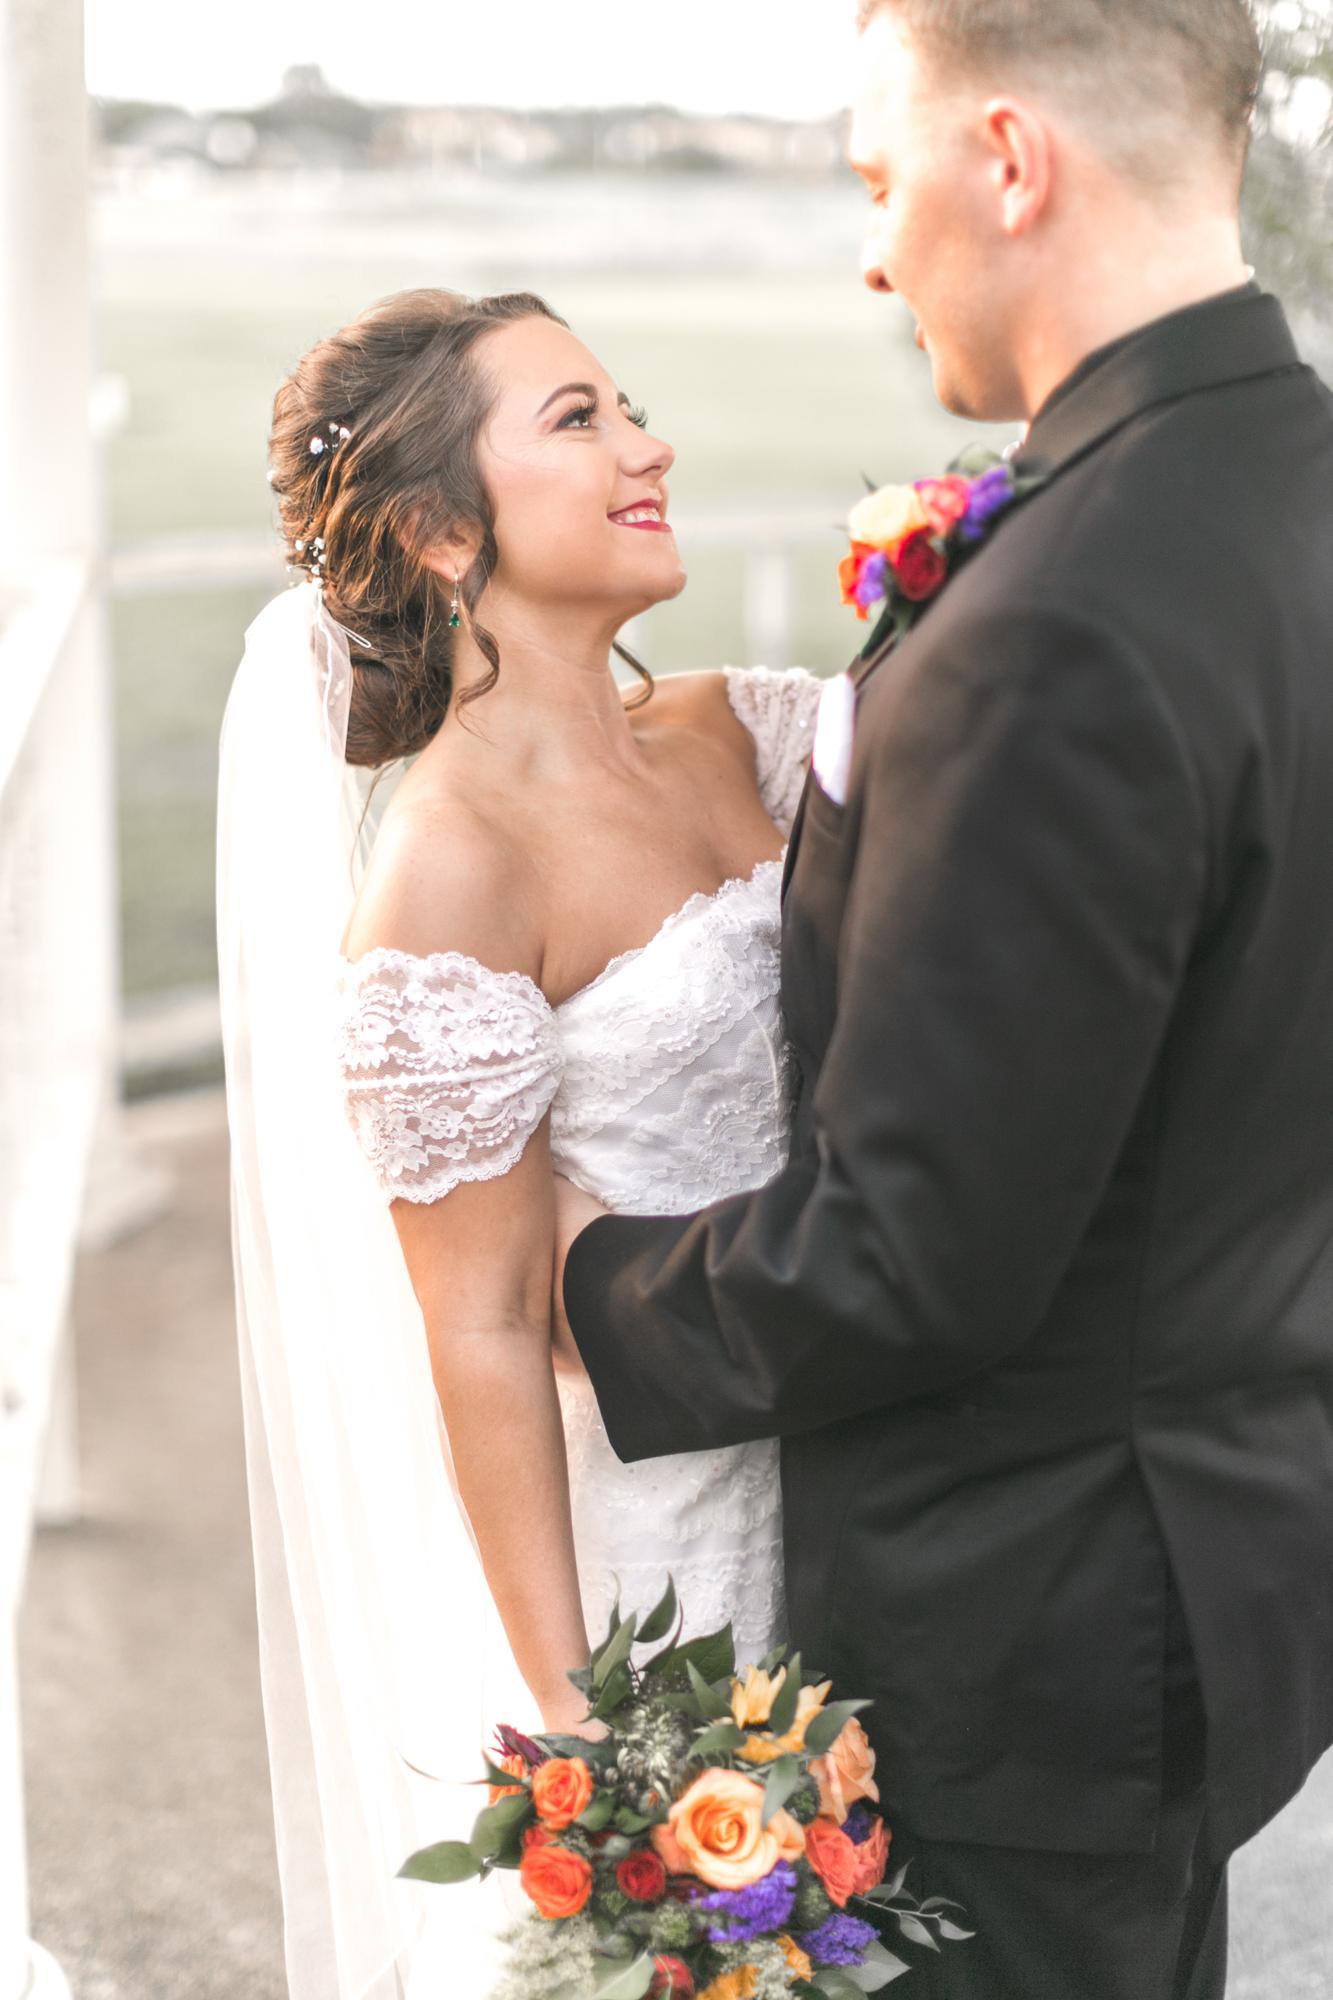 Seymour-Matte Wedding-7.jpg